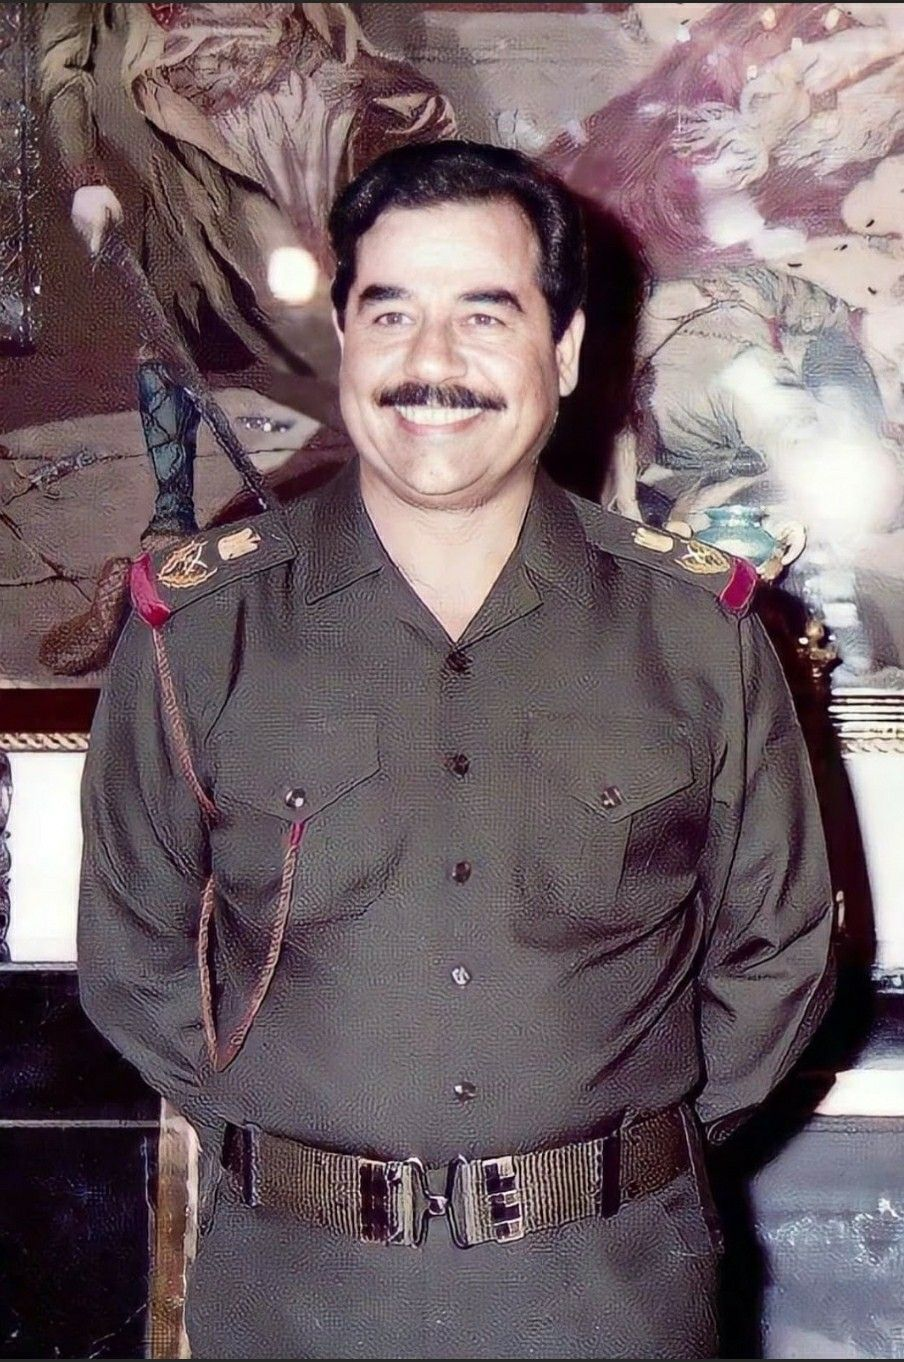 Pin By روائع الصور On صور صدام حسين عالية الوضوح In 2021 Baghdad Saddam Hussein Iraq